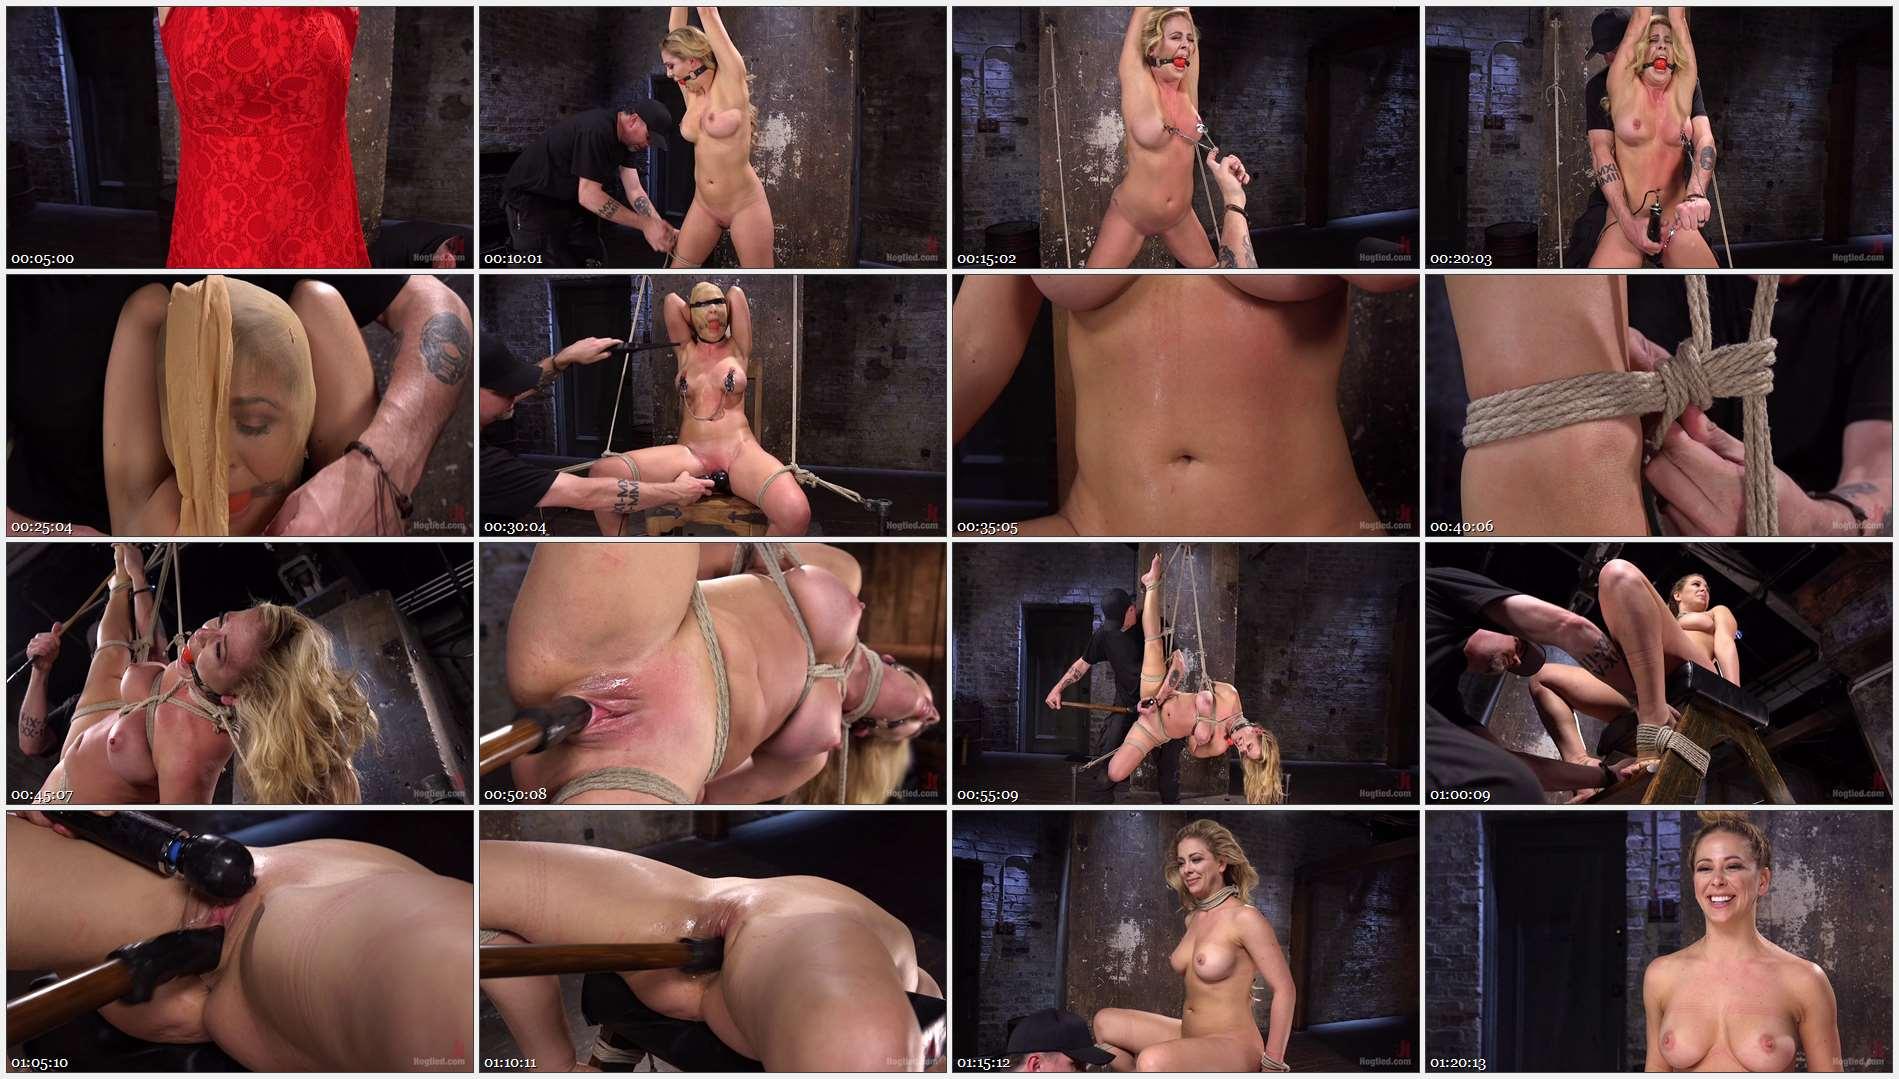 Cherie DeVille – Hot Blonde MILF Suffers Through Grueling Bondage